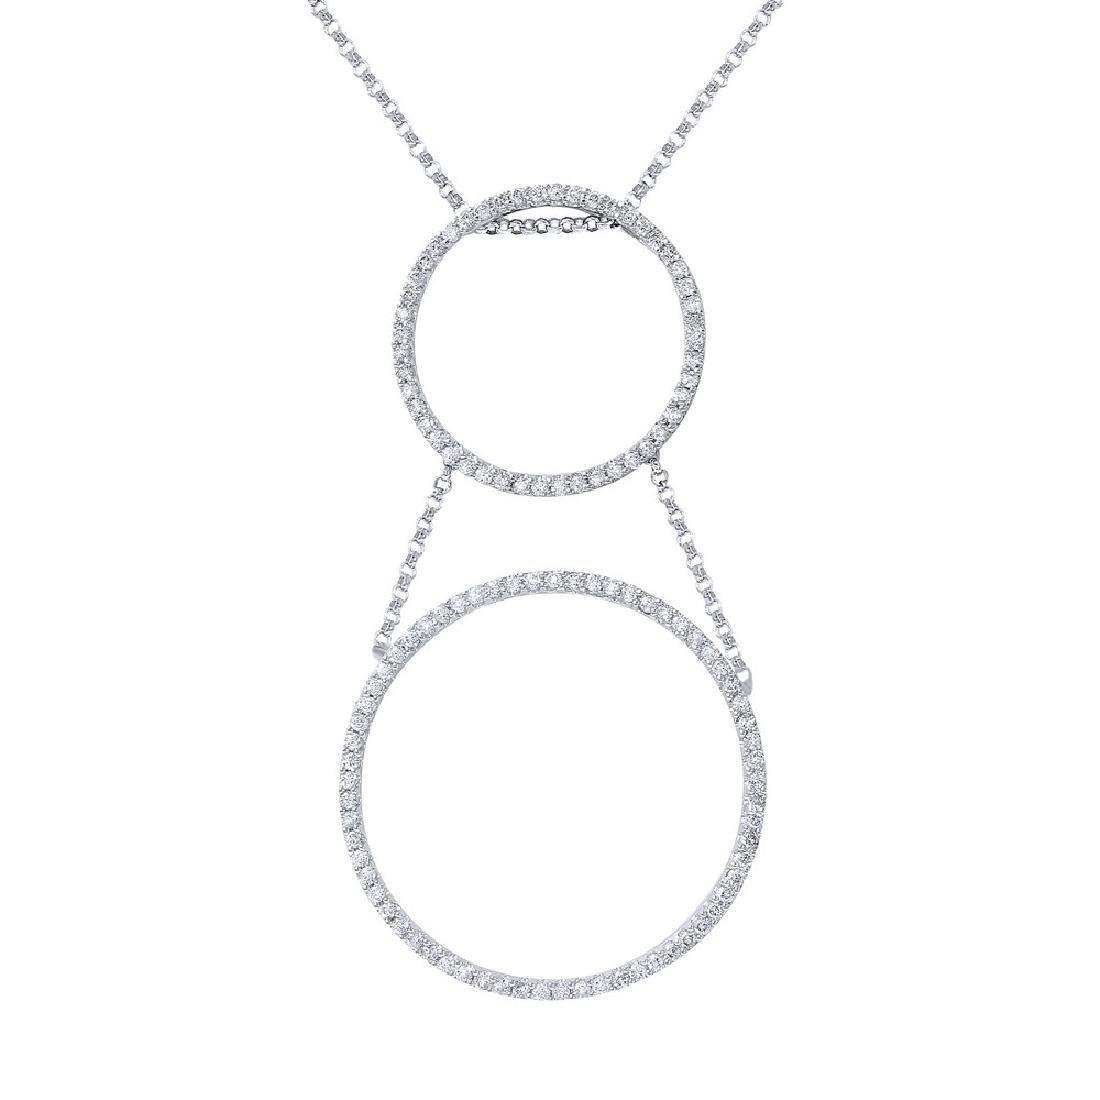 Genuine 1.44 TCW 18K White Gold Ladies Necklace